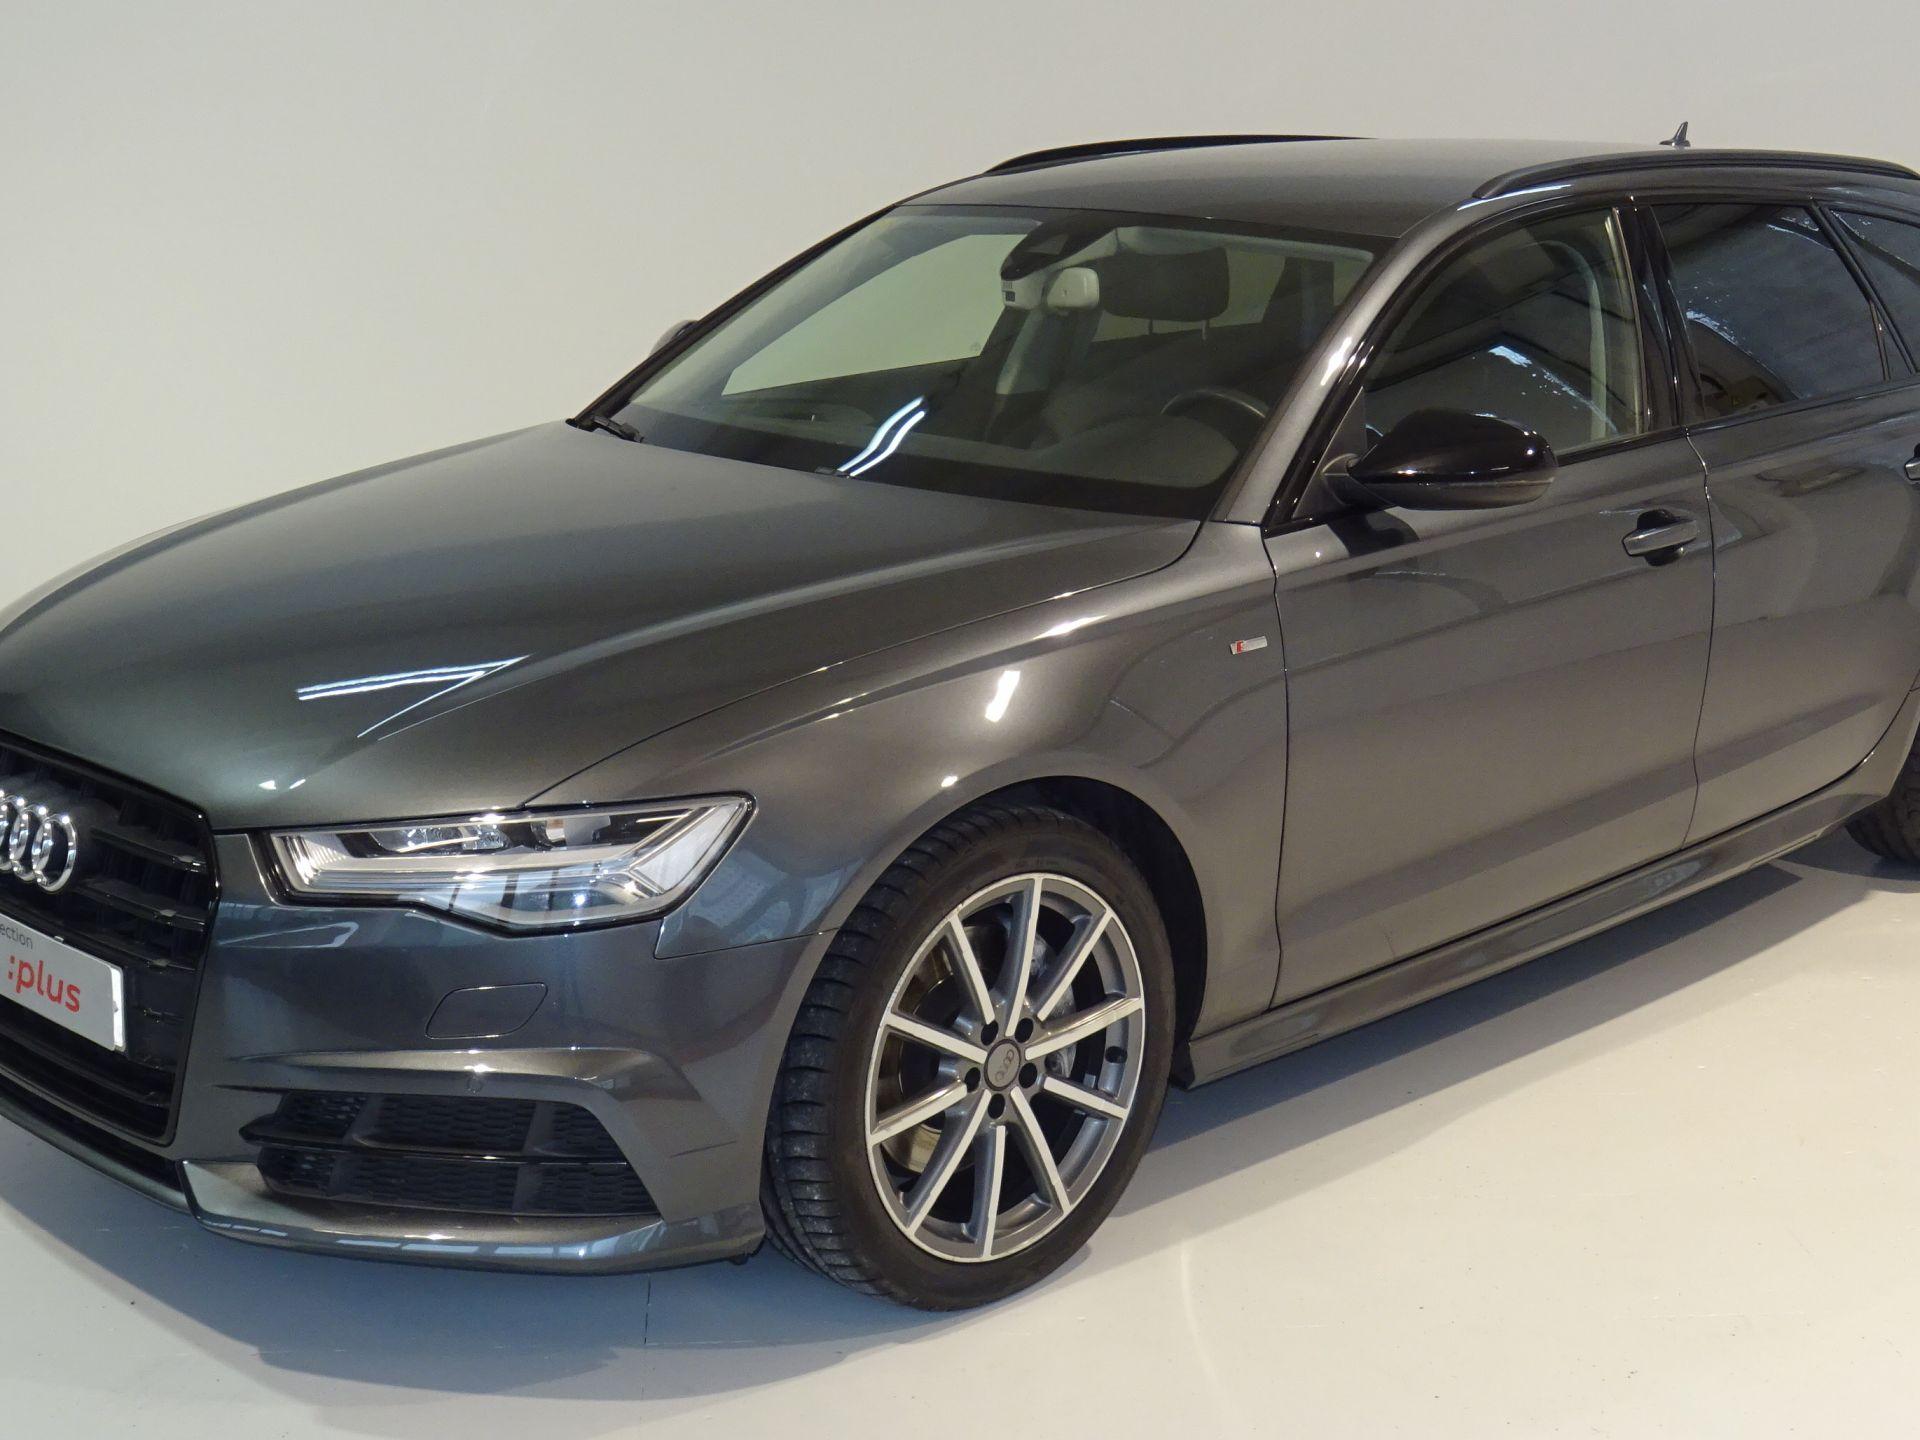 Audi A6 Black line ed 3.0TDI 200kW Q S tro Avant